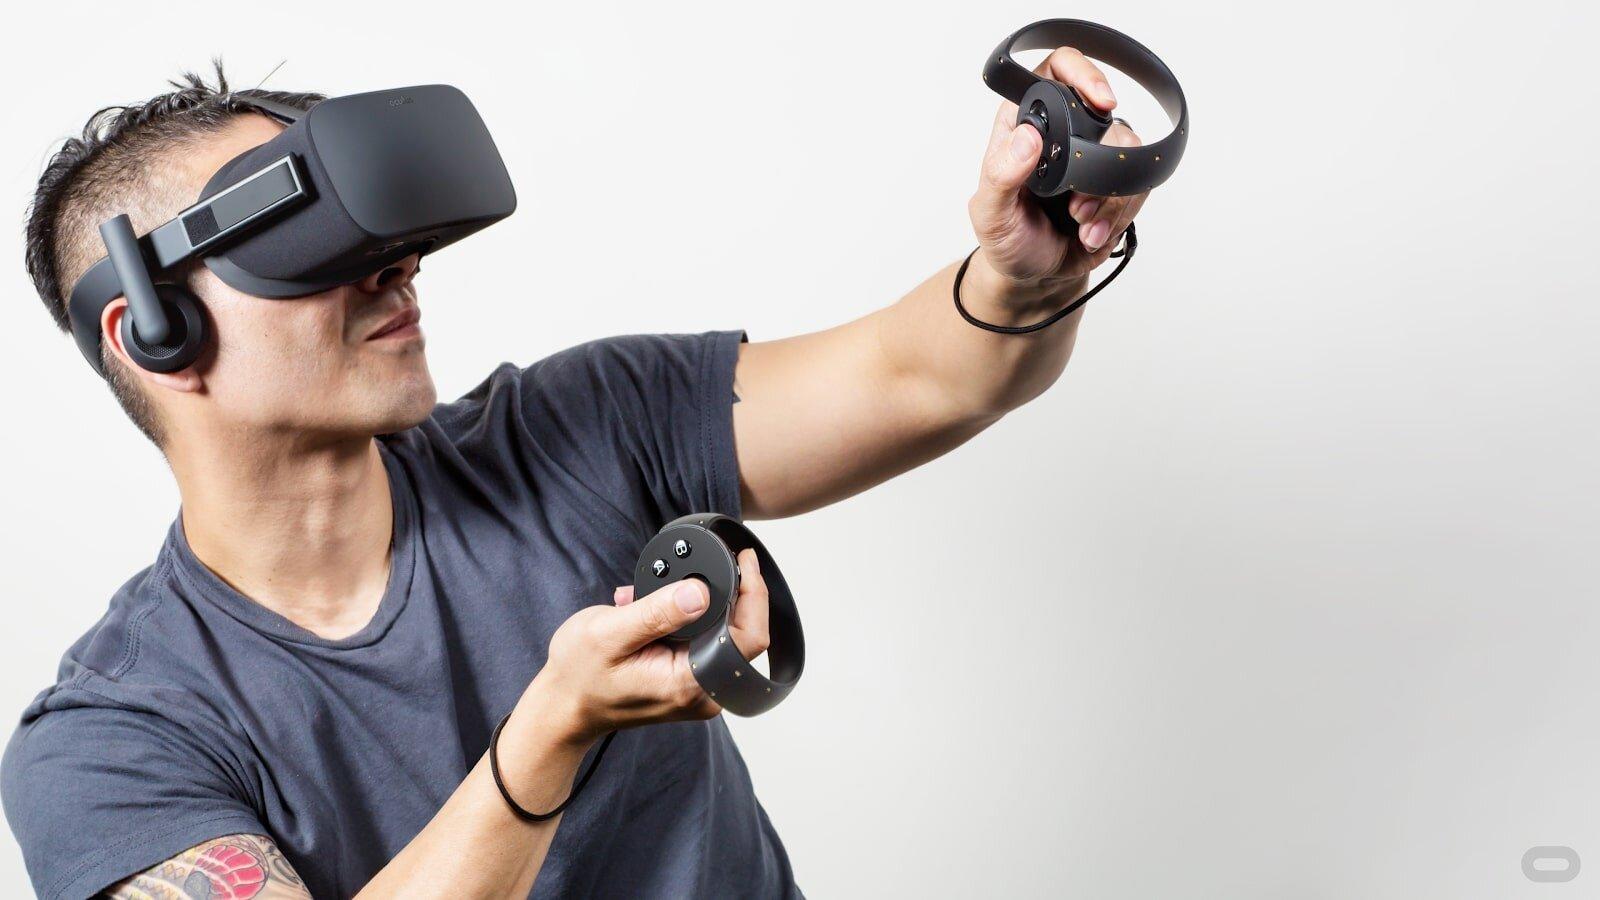 Kính VR Oculus Rift